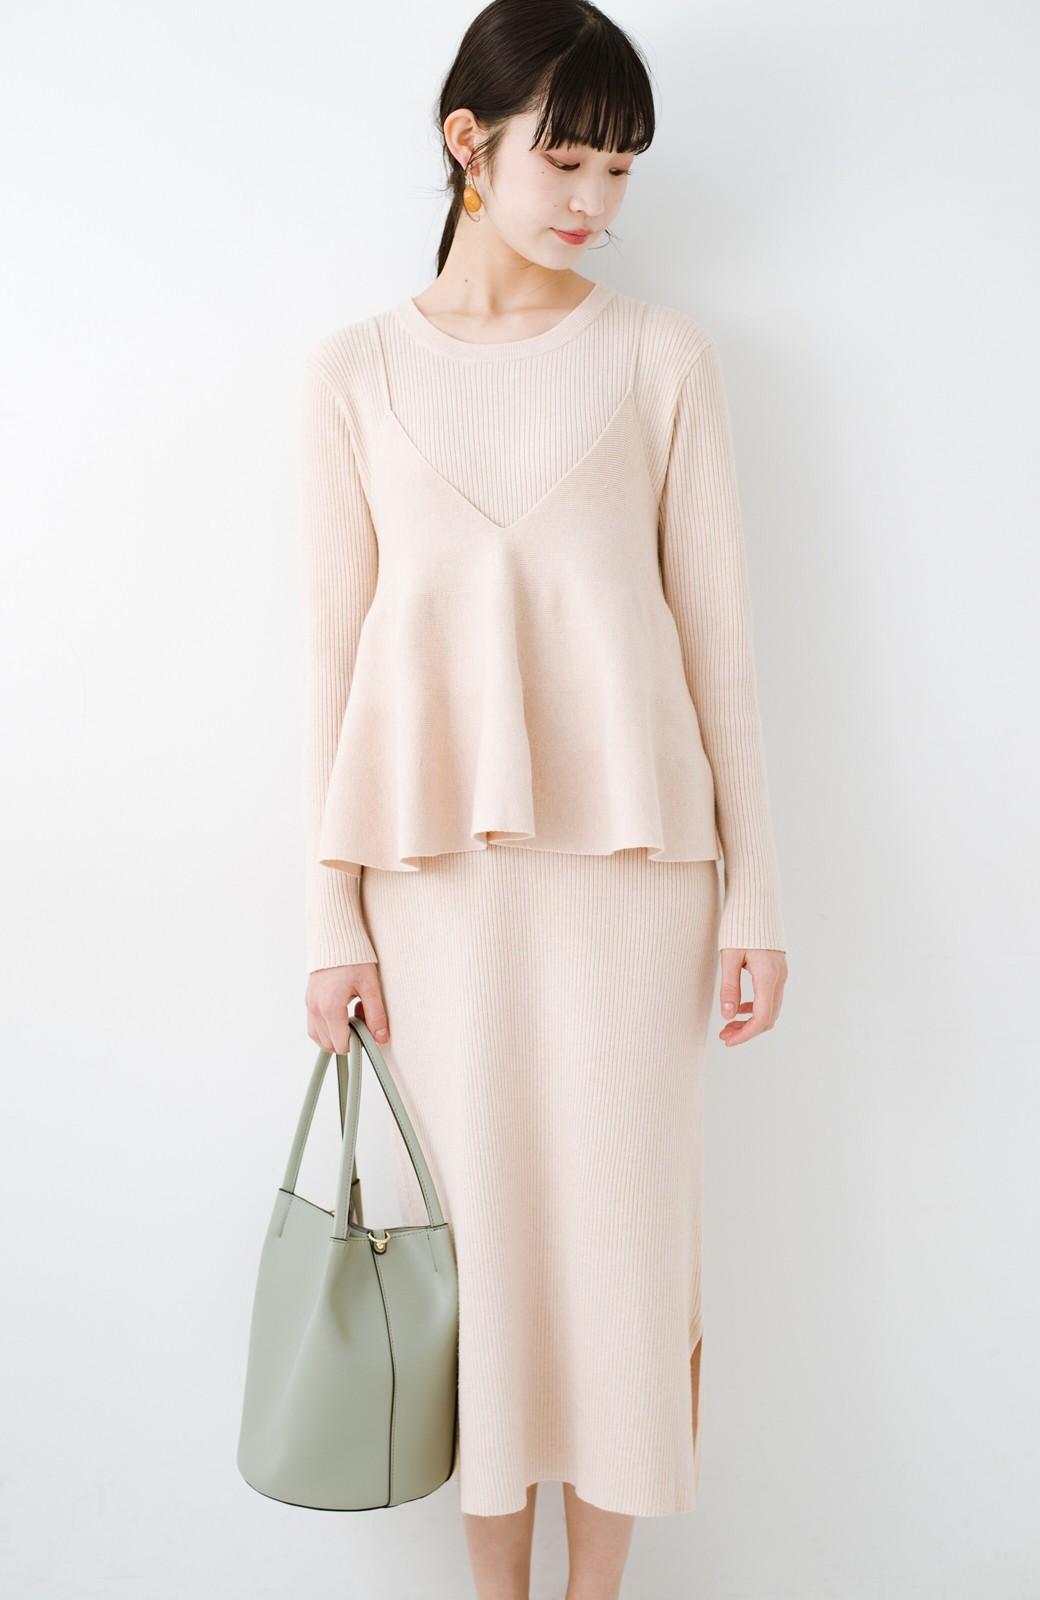 haco! ニットワンピースとキャミソールを重ねて着るだけでパッとオシャレに見えるうれしいセット by style zampa <ライトベージュ>の商品写真9